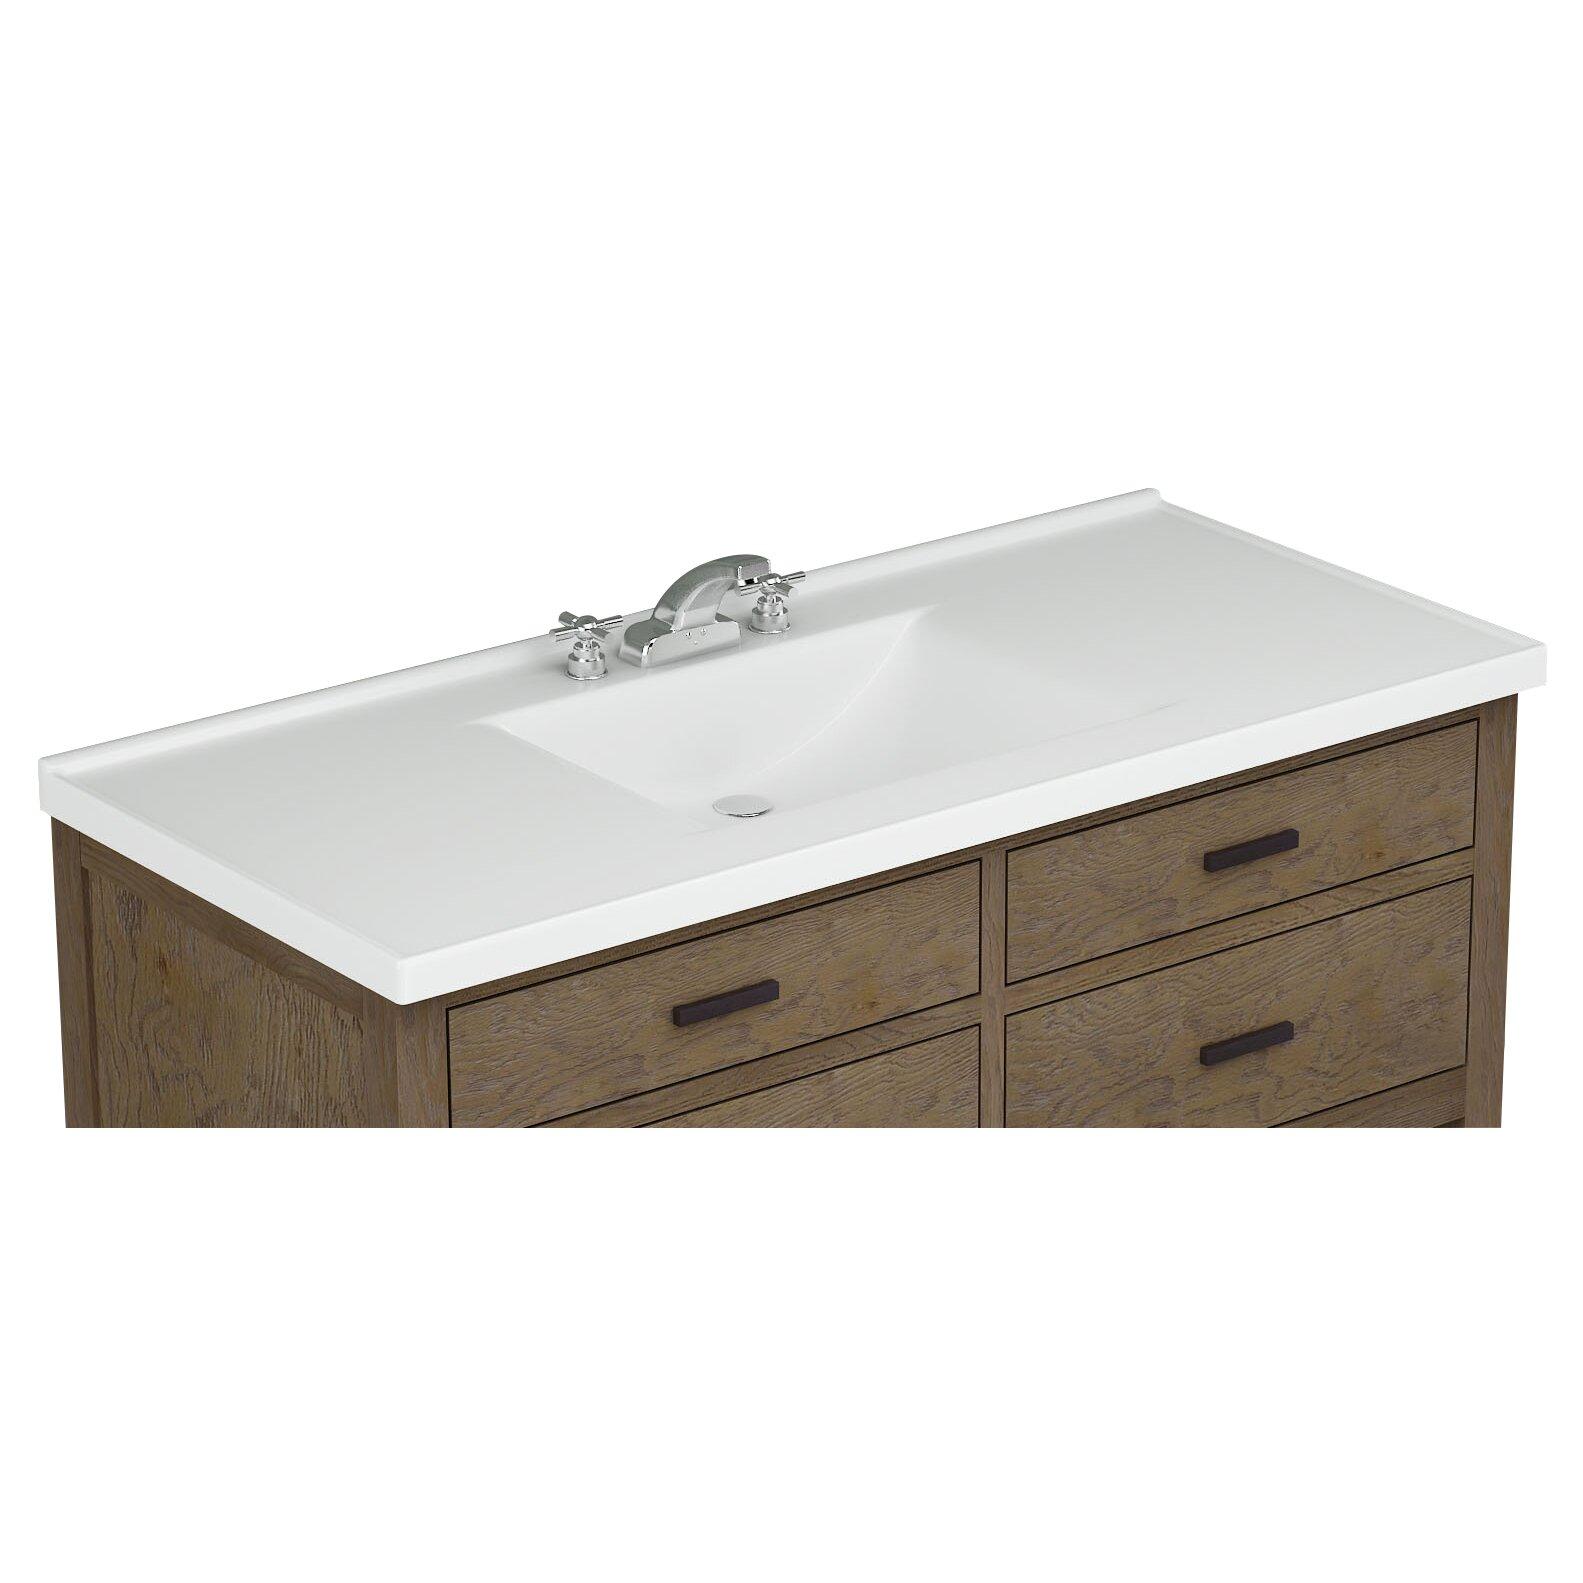 premier tops 49 bathroom vanity top with integrated basin. Black Bedroom Furniture Sets. Home Design Ideas